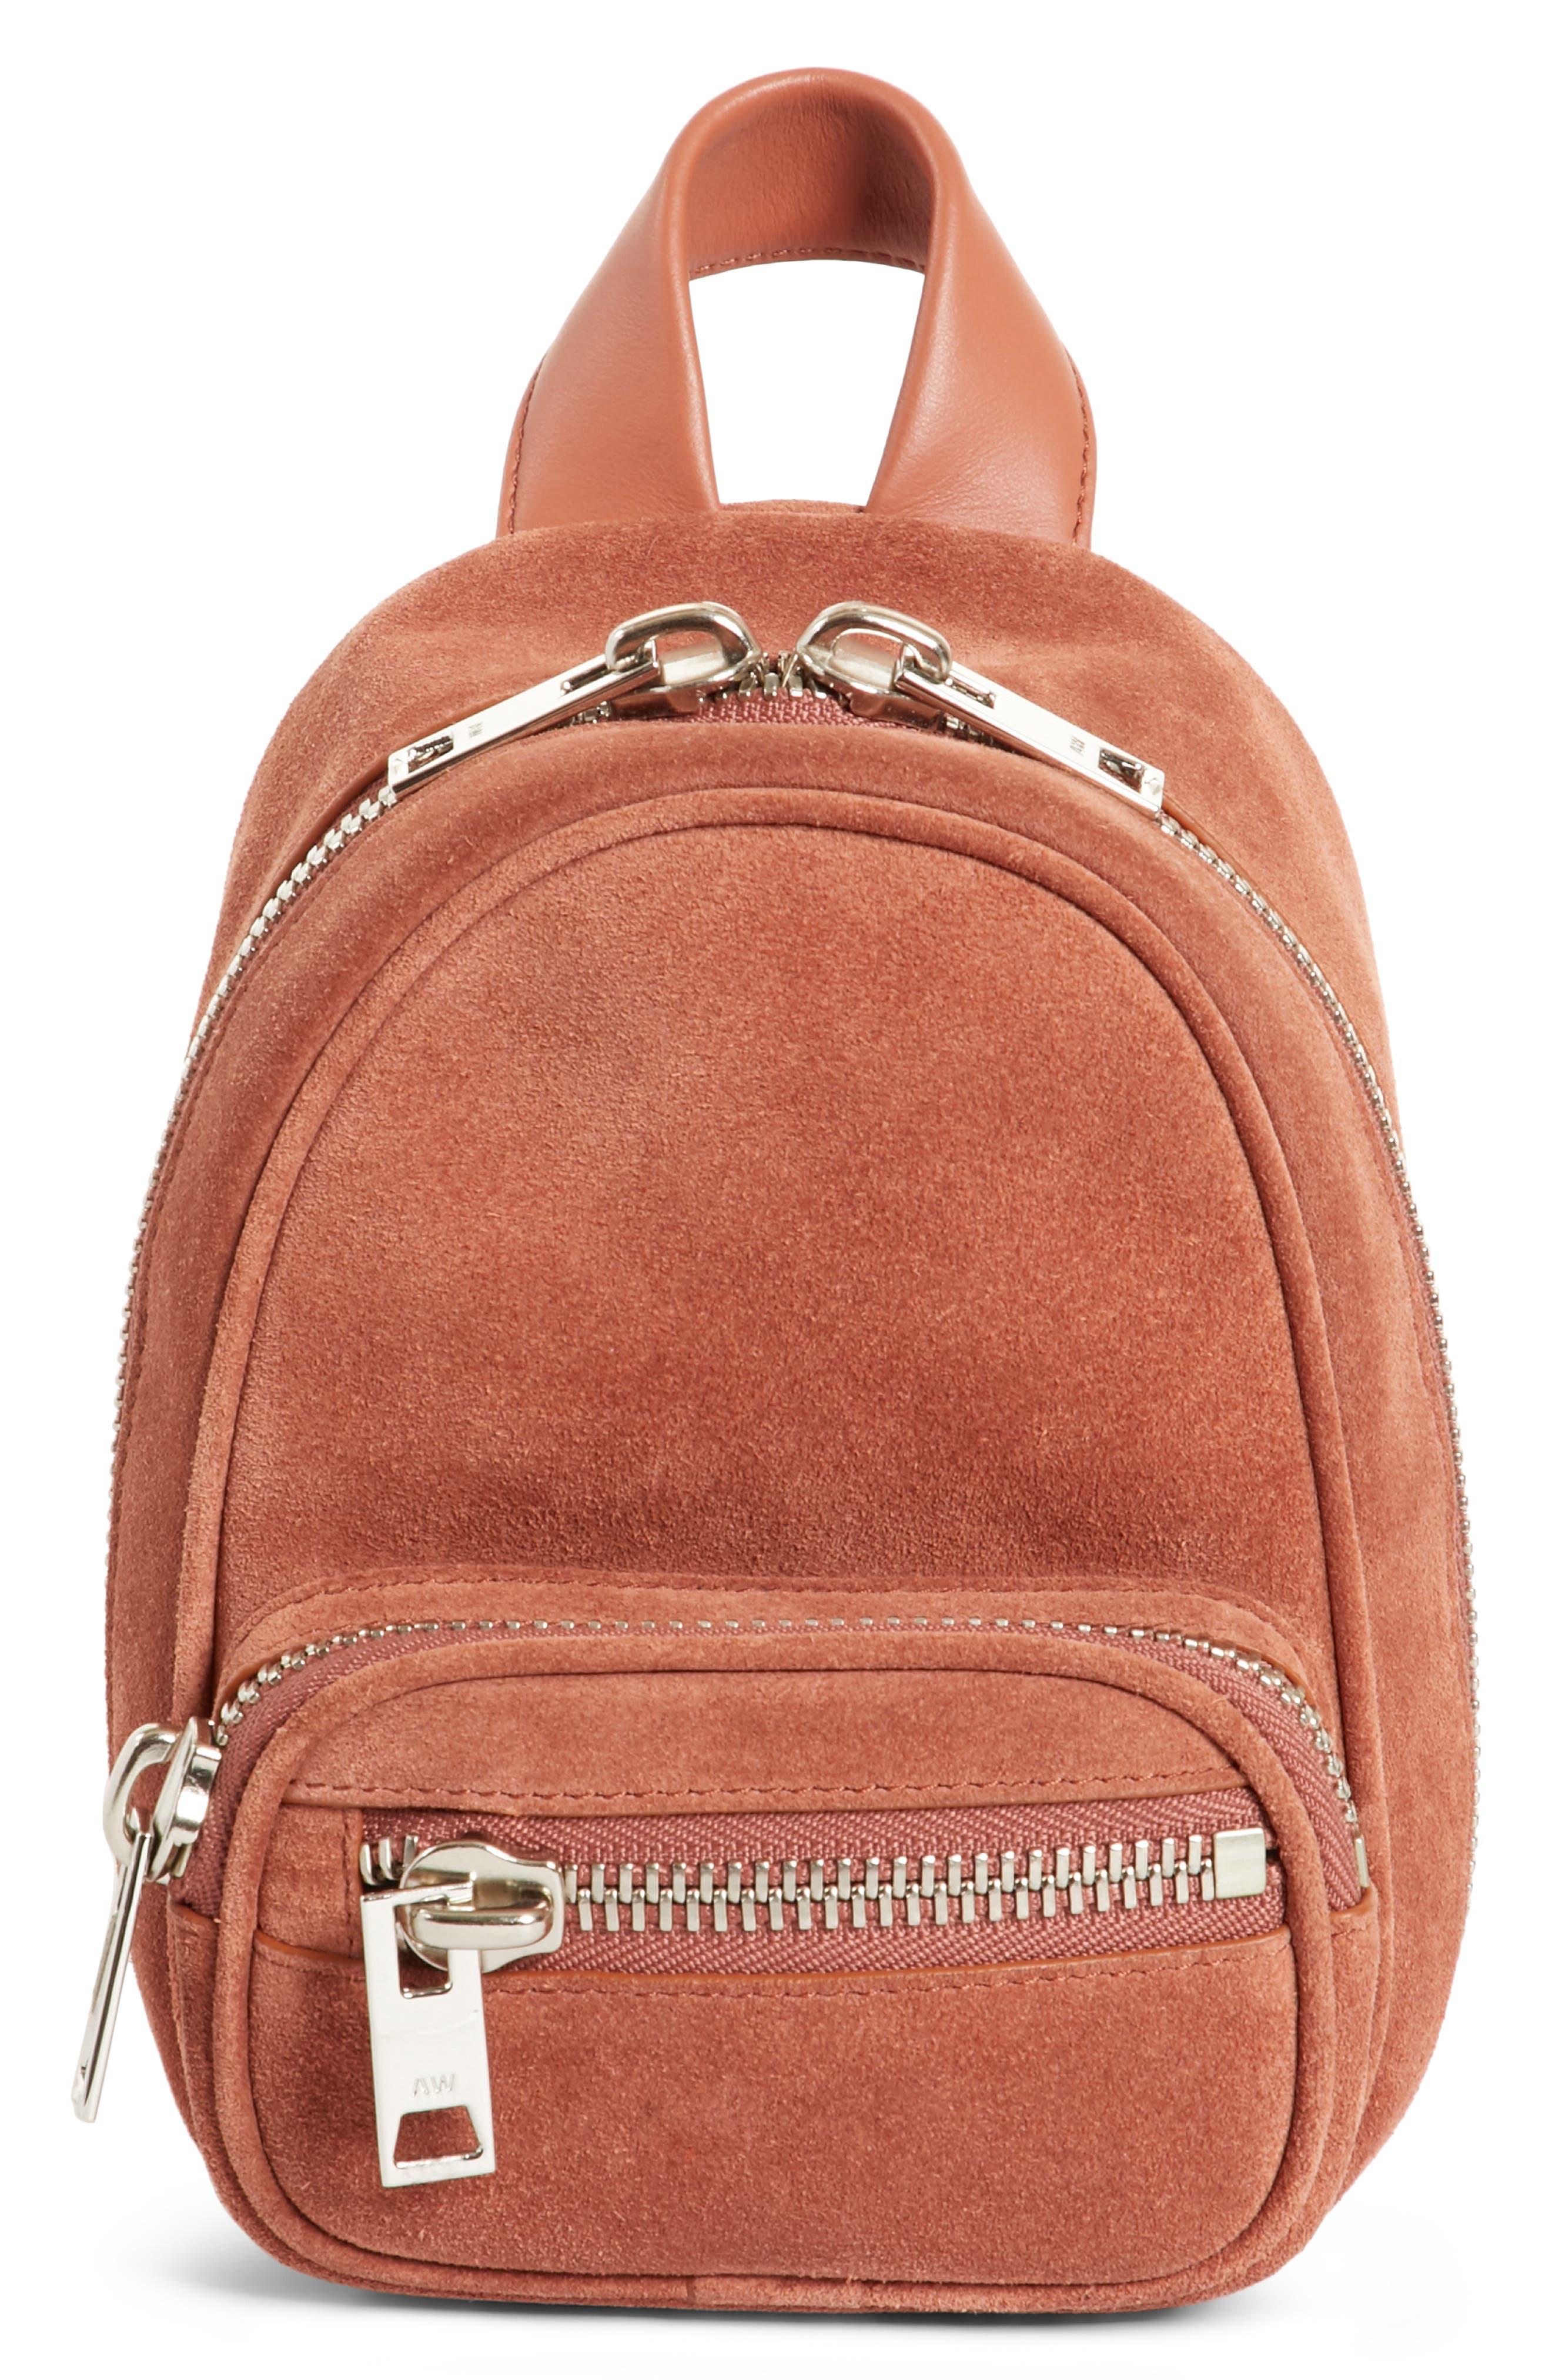 Main Image - Alexander Wang Mini Attica Suede Backpack-Shaped Crossbody Bag